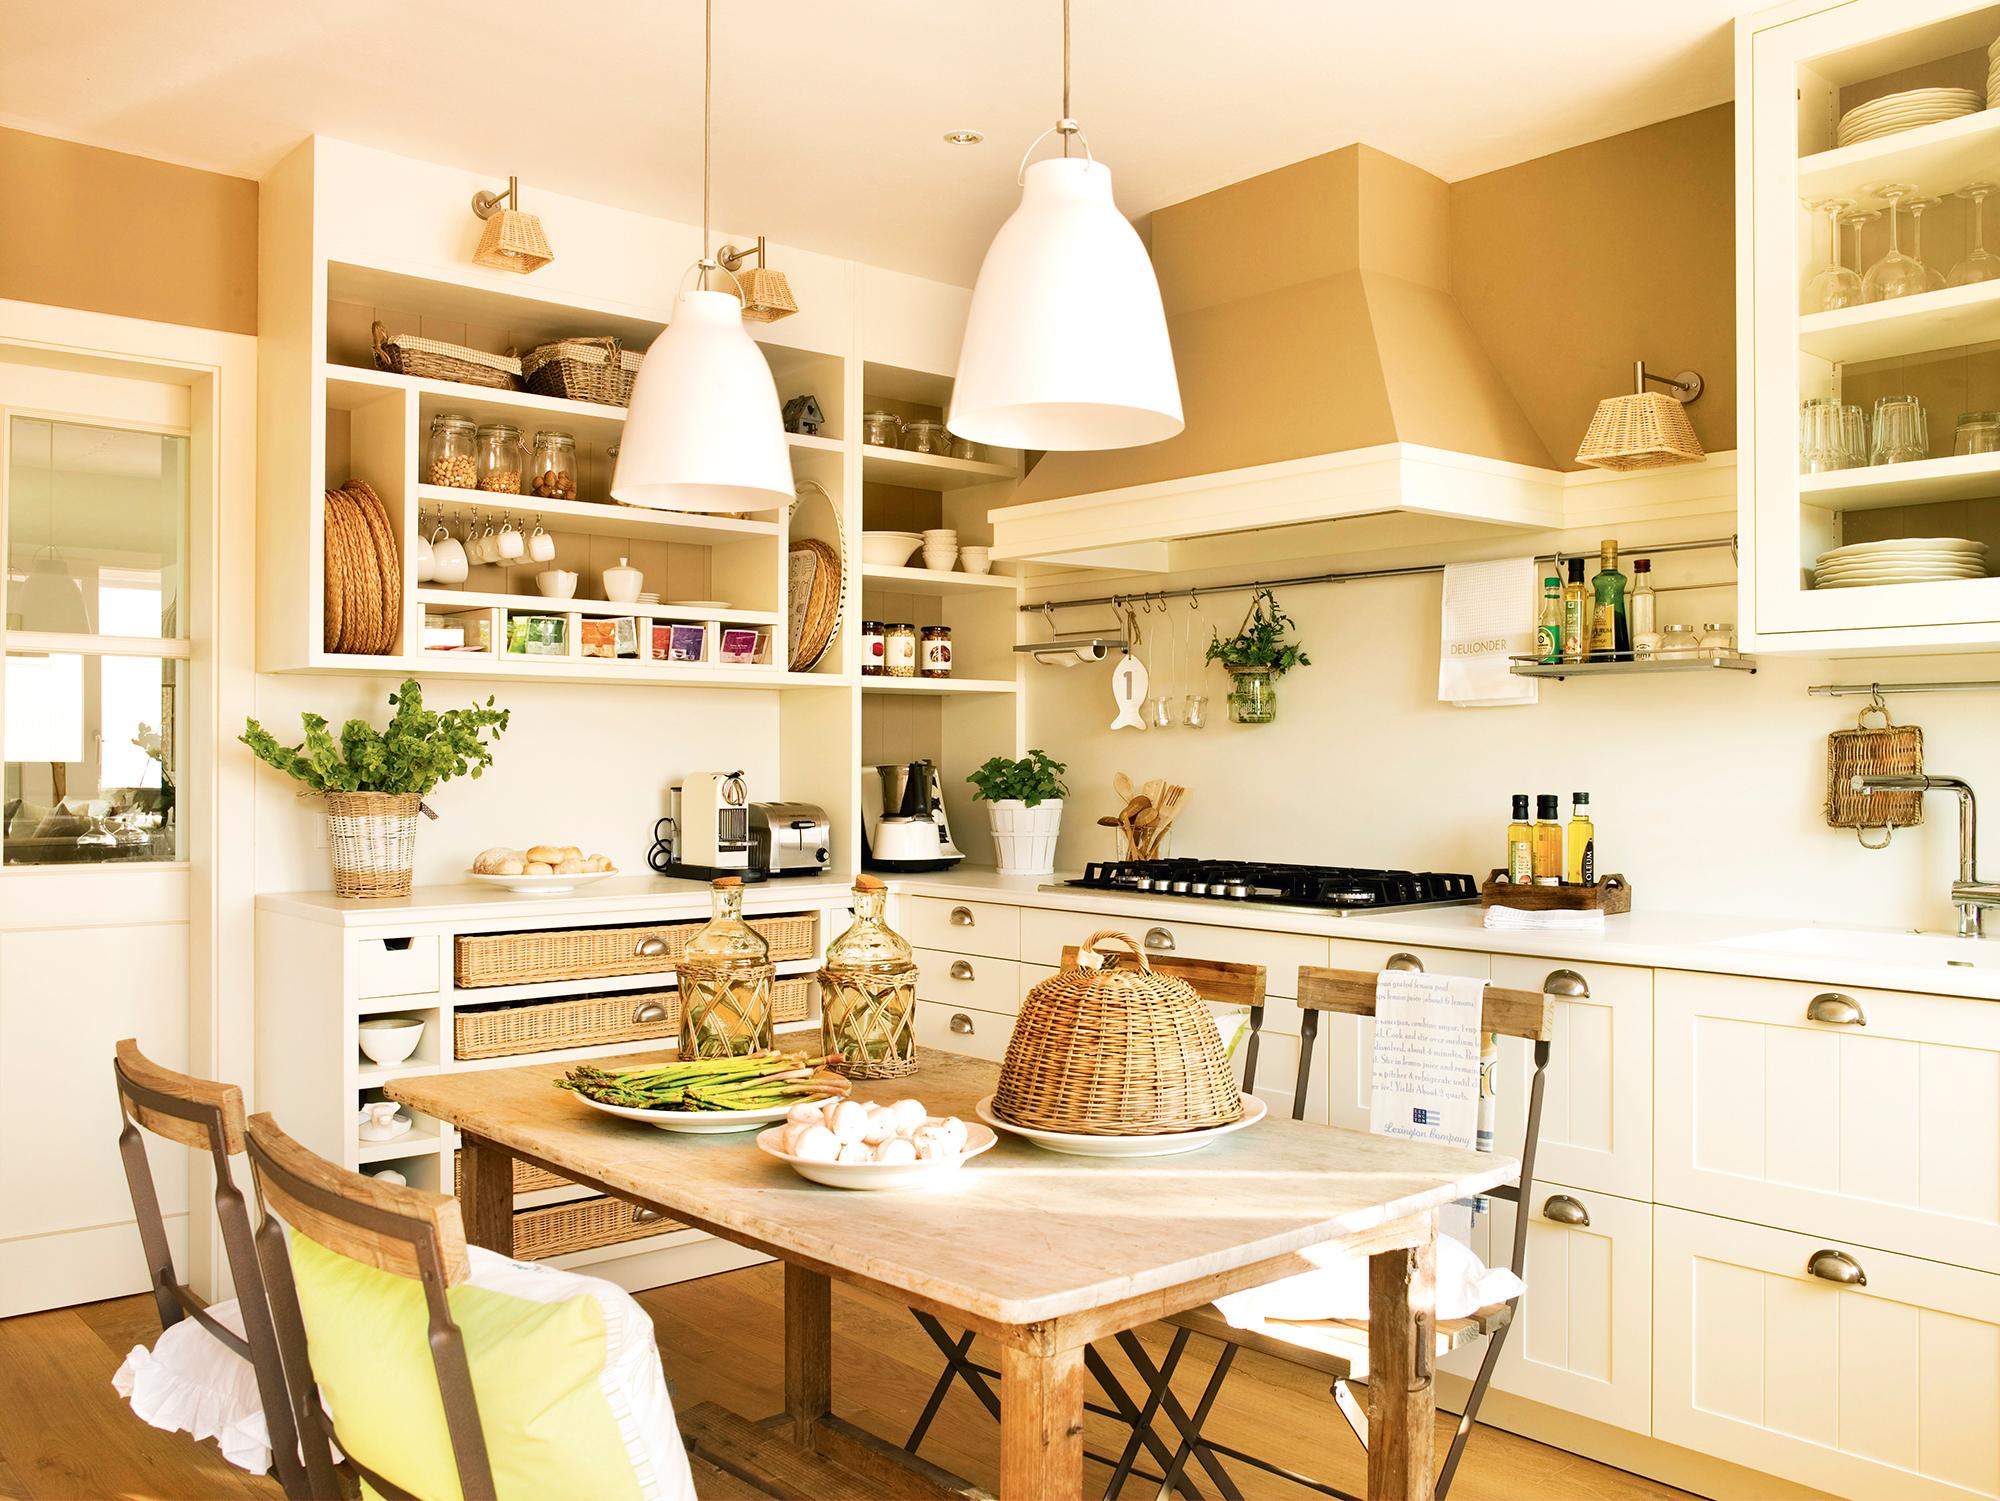 Pintura Baos Y Cocinas Cheap Elegant Baos Cocinas Y Pintura - Pintura-baos-y-cocinas